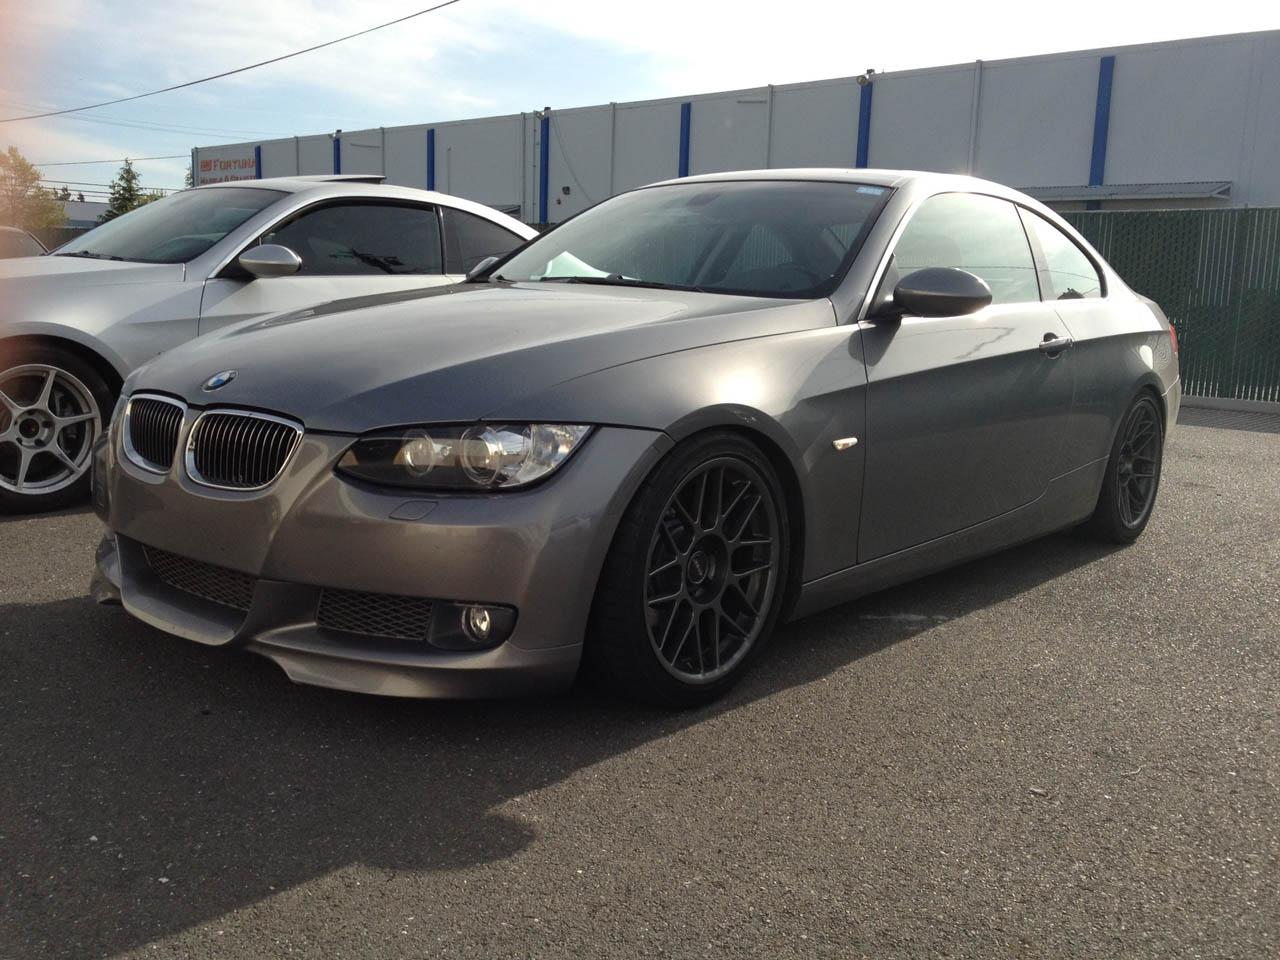 2007 BMW 335Xi >> 2007 BMW 335i Coupe VISHNU Procede 1/4 mile Drag Racing timeslip specs 0-60 - DragTimes.com